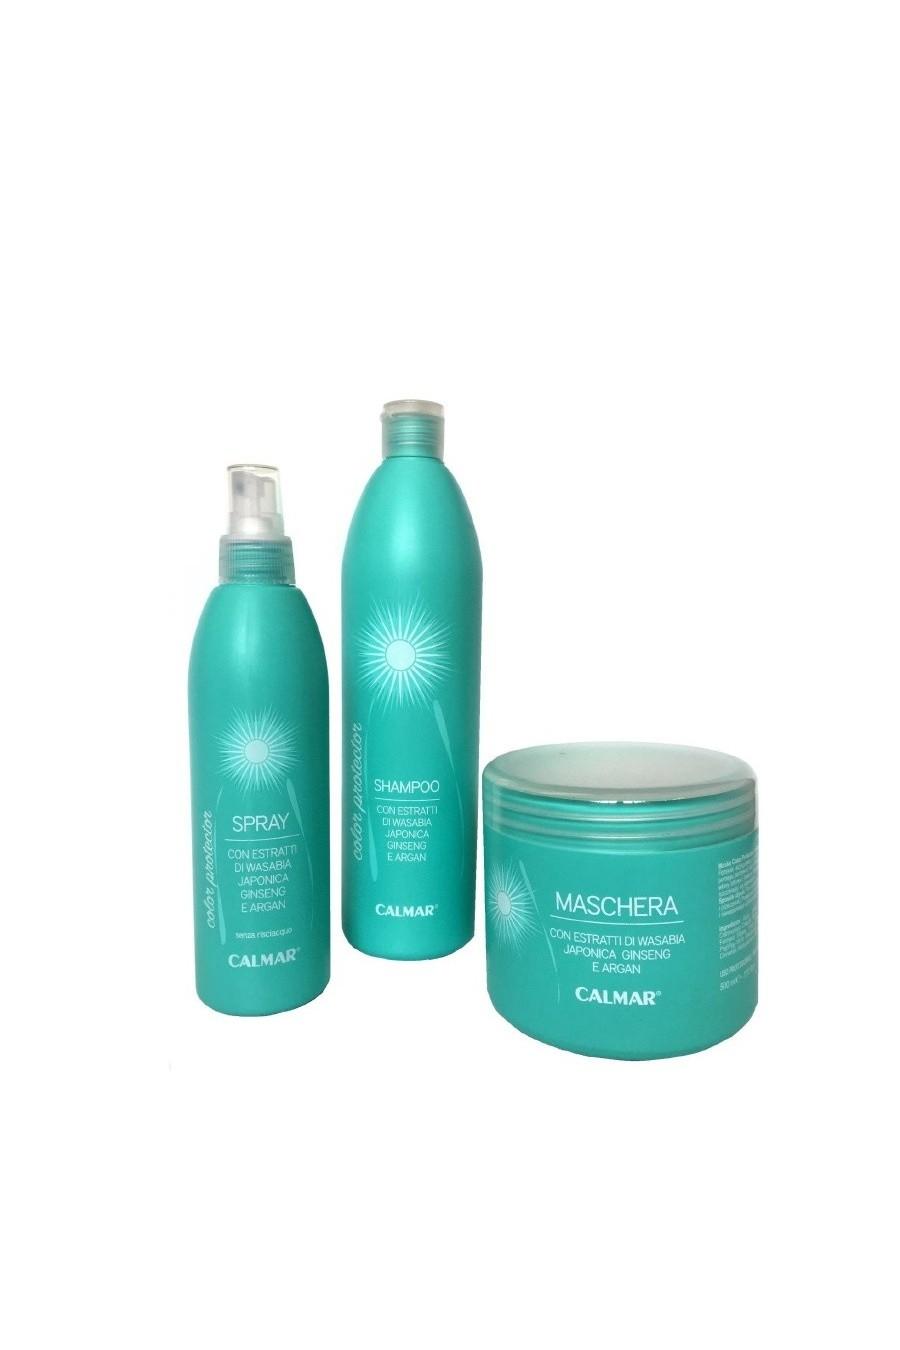 LINEA COLOR PROTECTOR (Shampoo, maschera, spray protettivo)